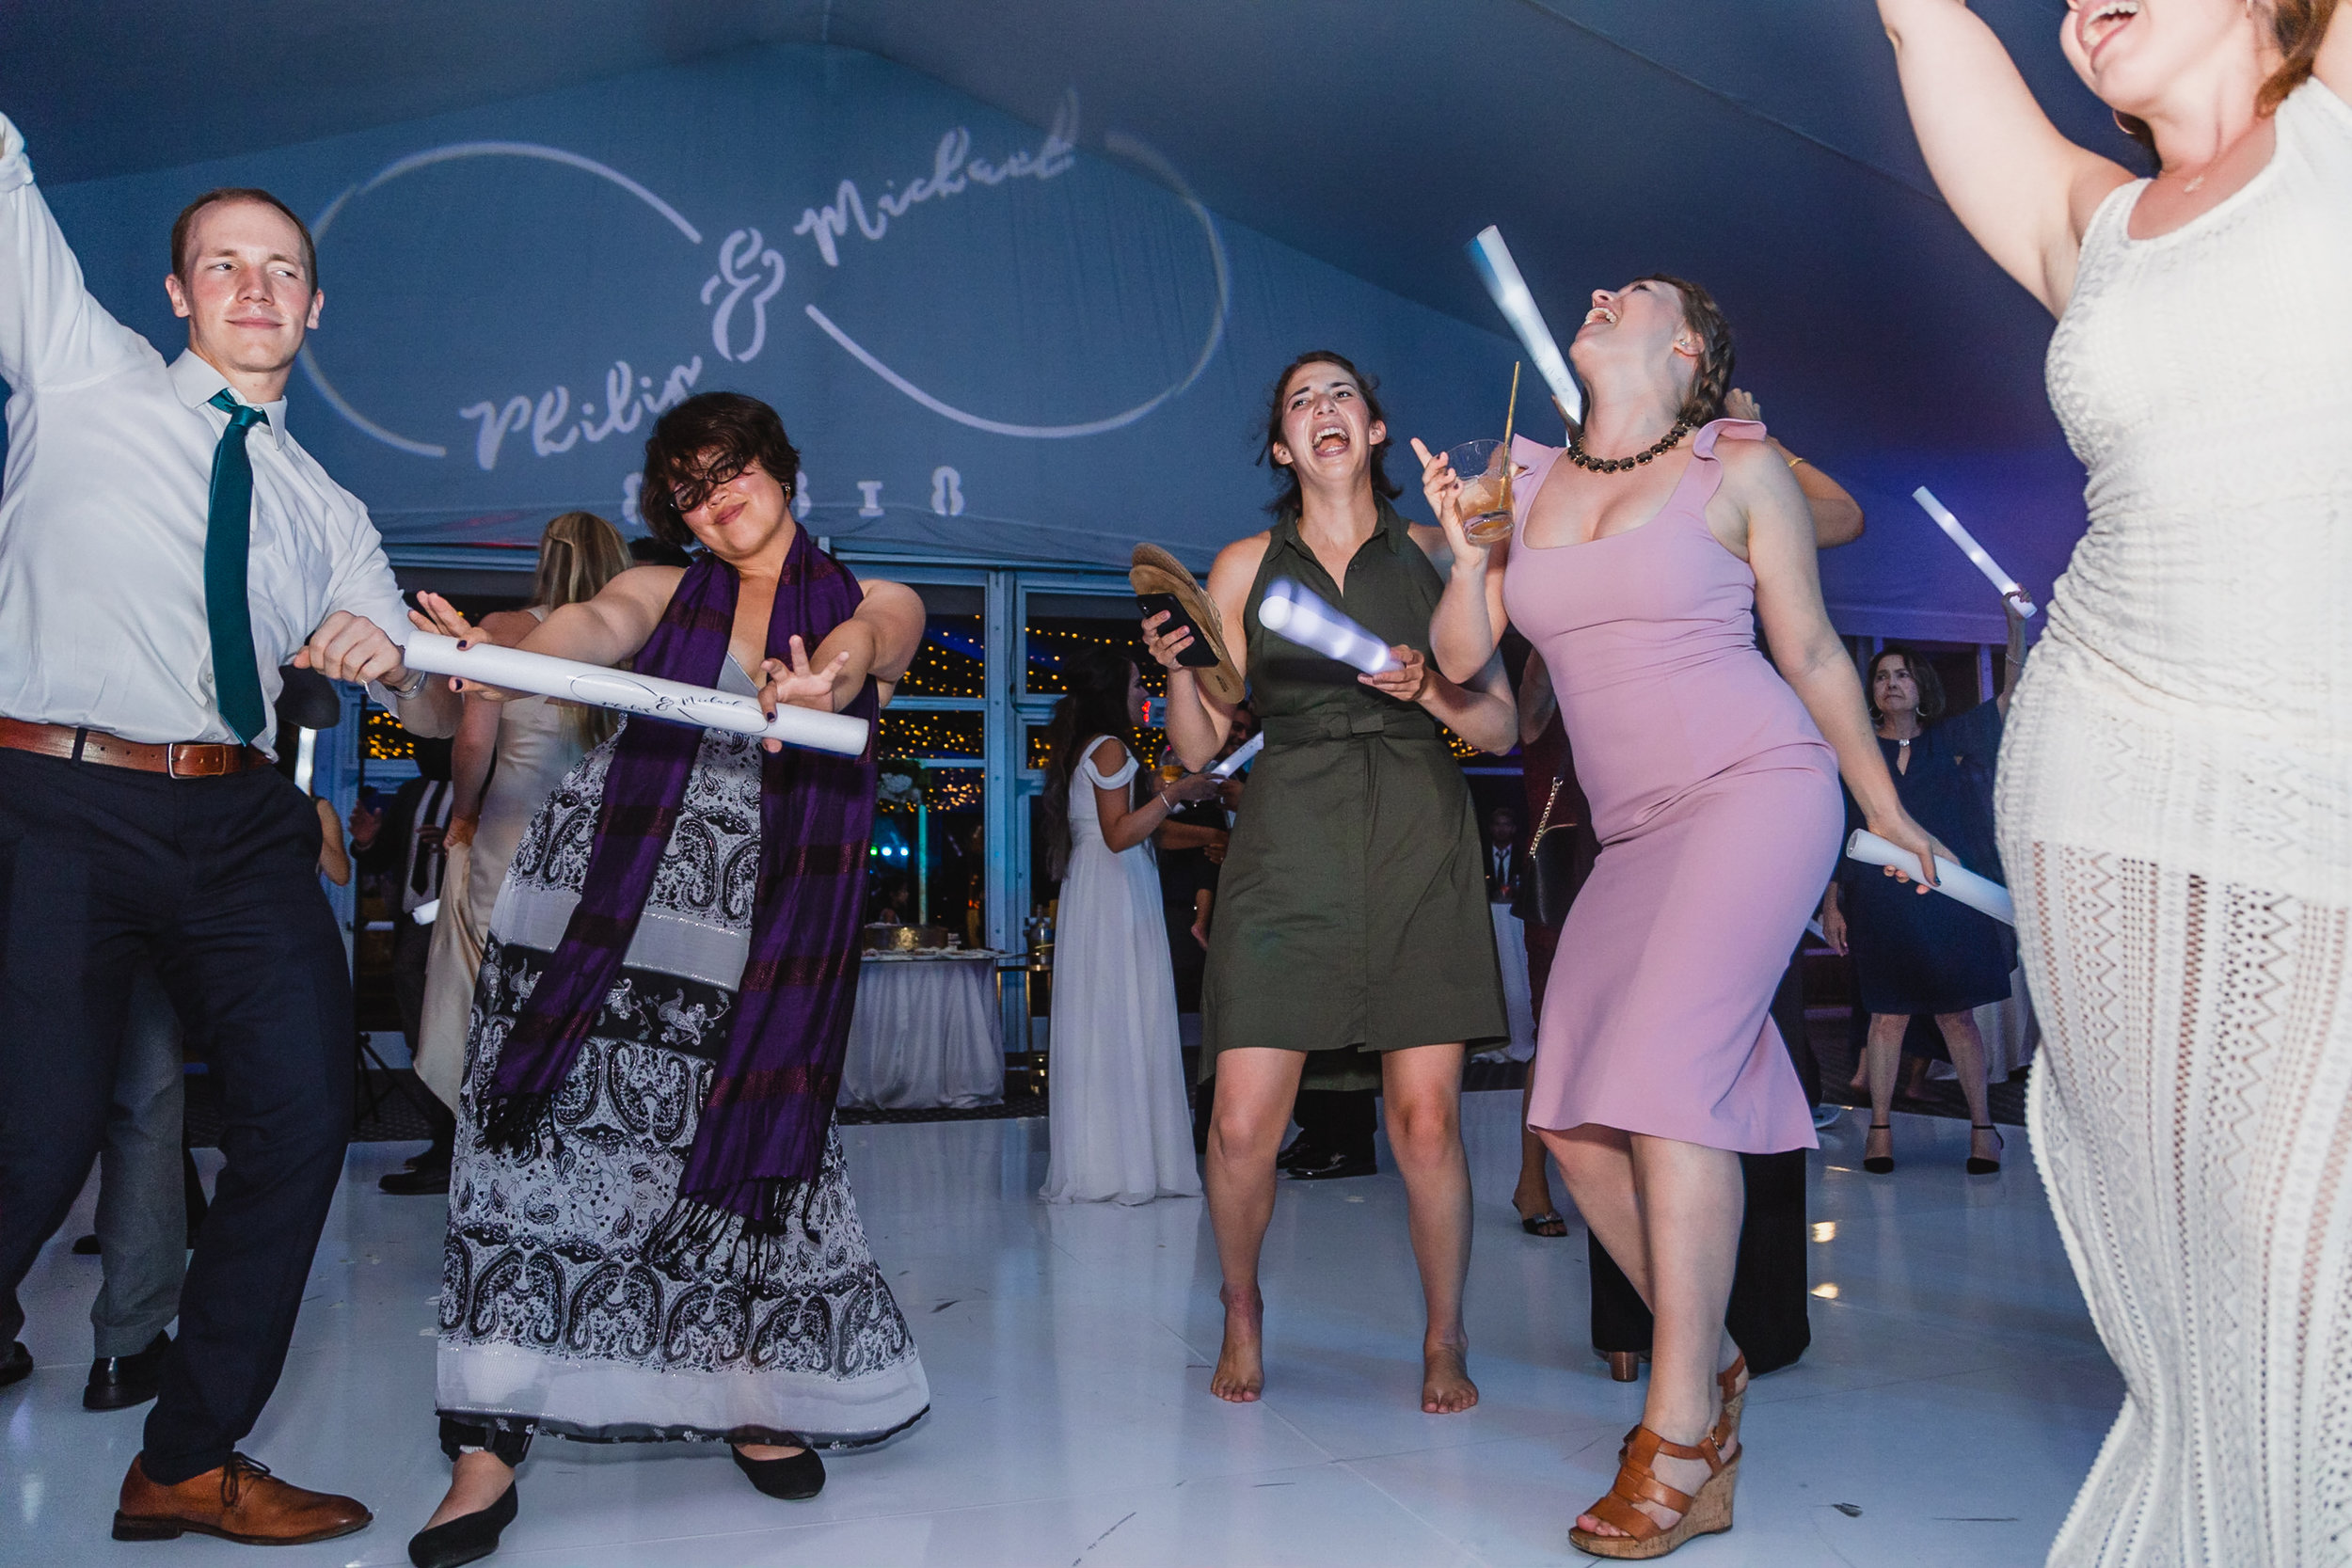 rebeccaylasotras-sandiego-lgbt-wedding-photography-125.jpg